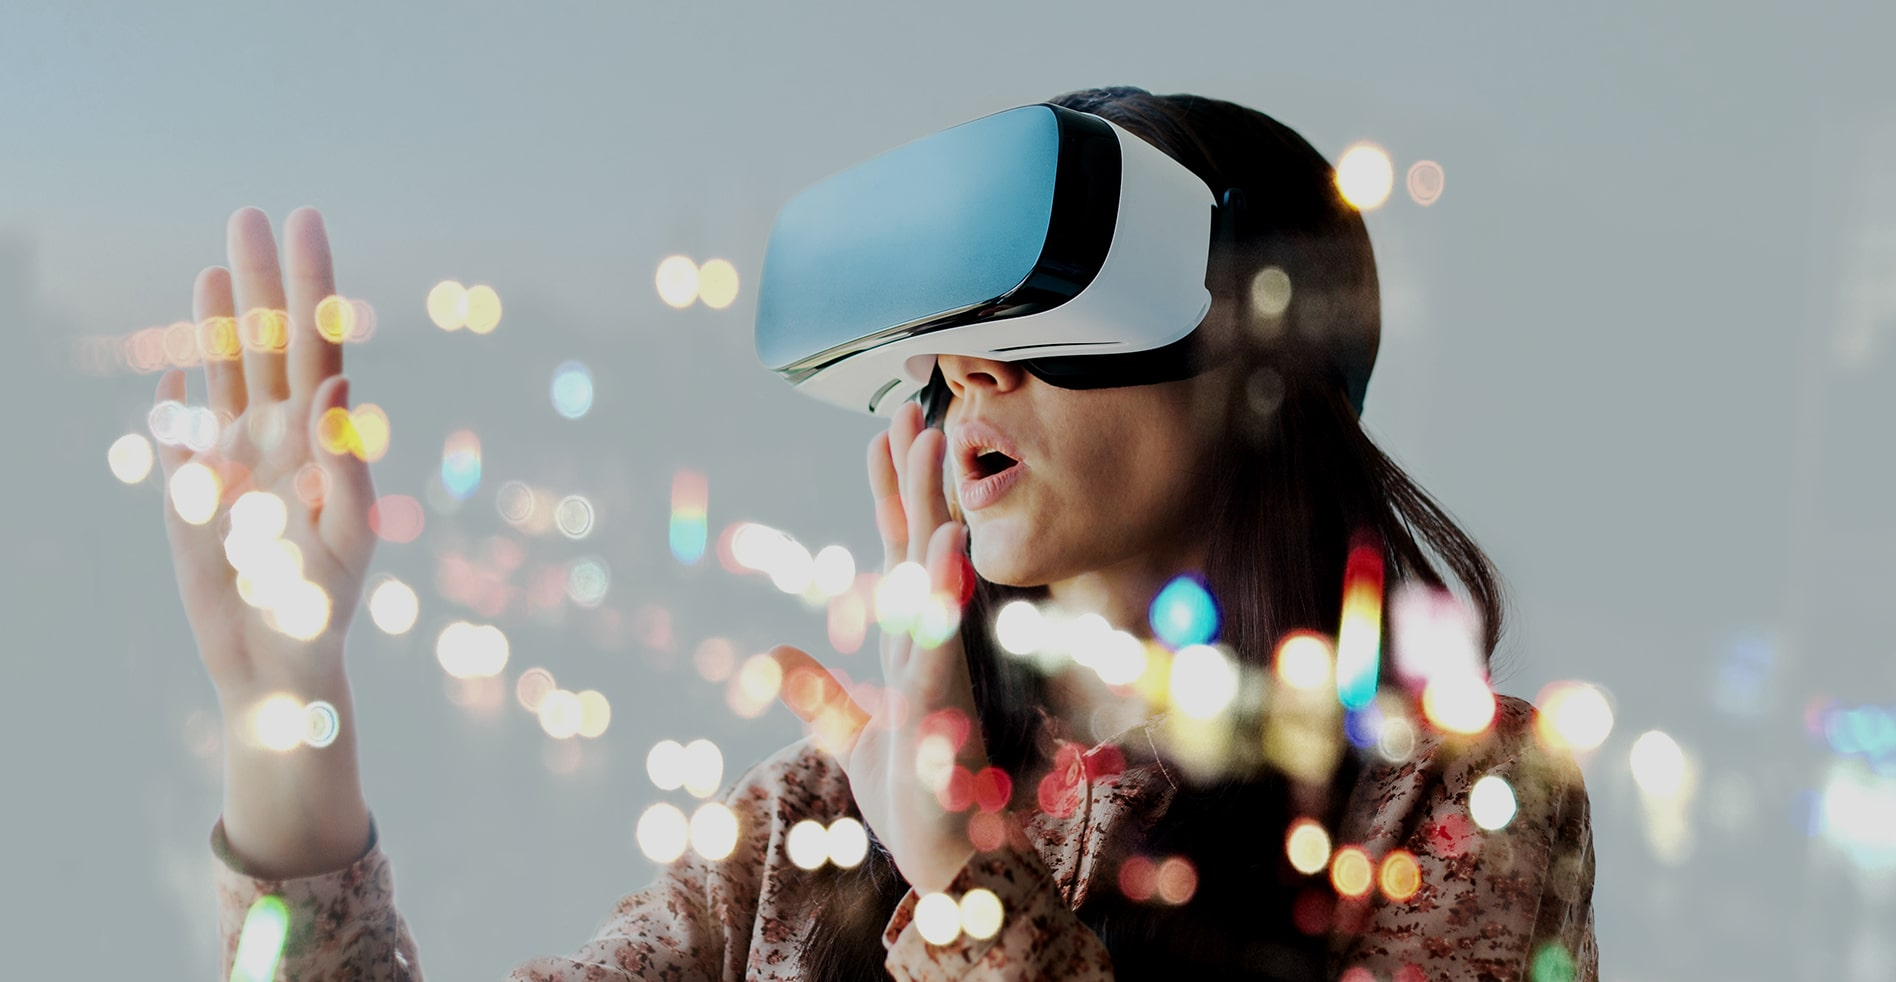 woman uses futuristic augmented reality headset